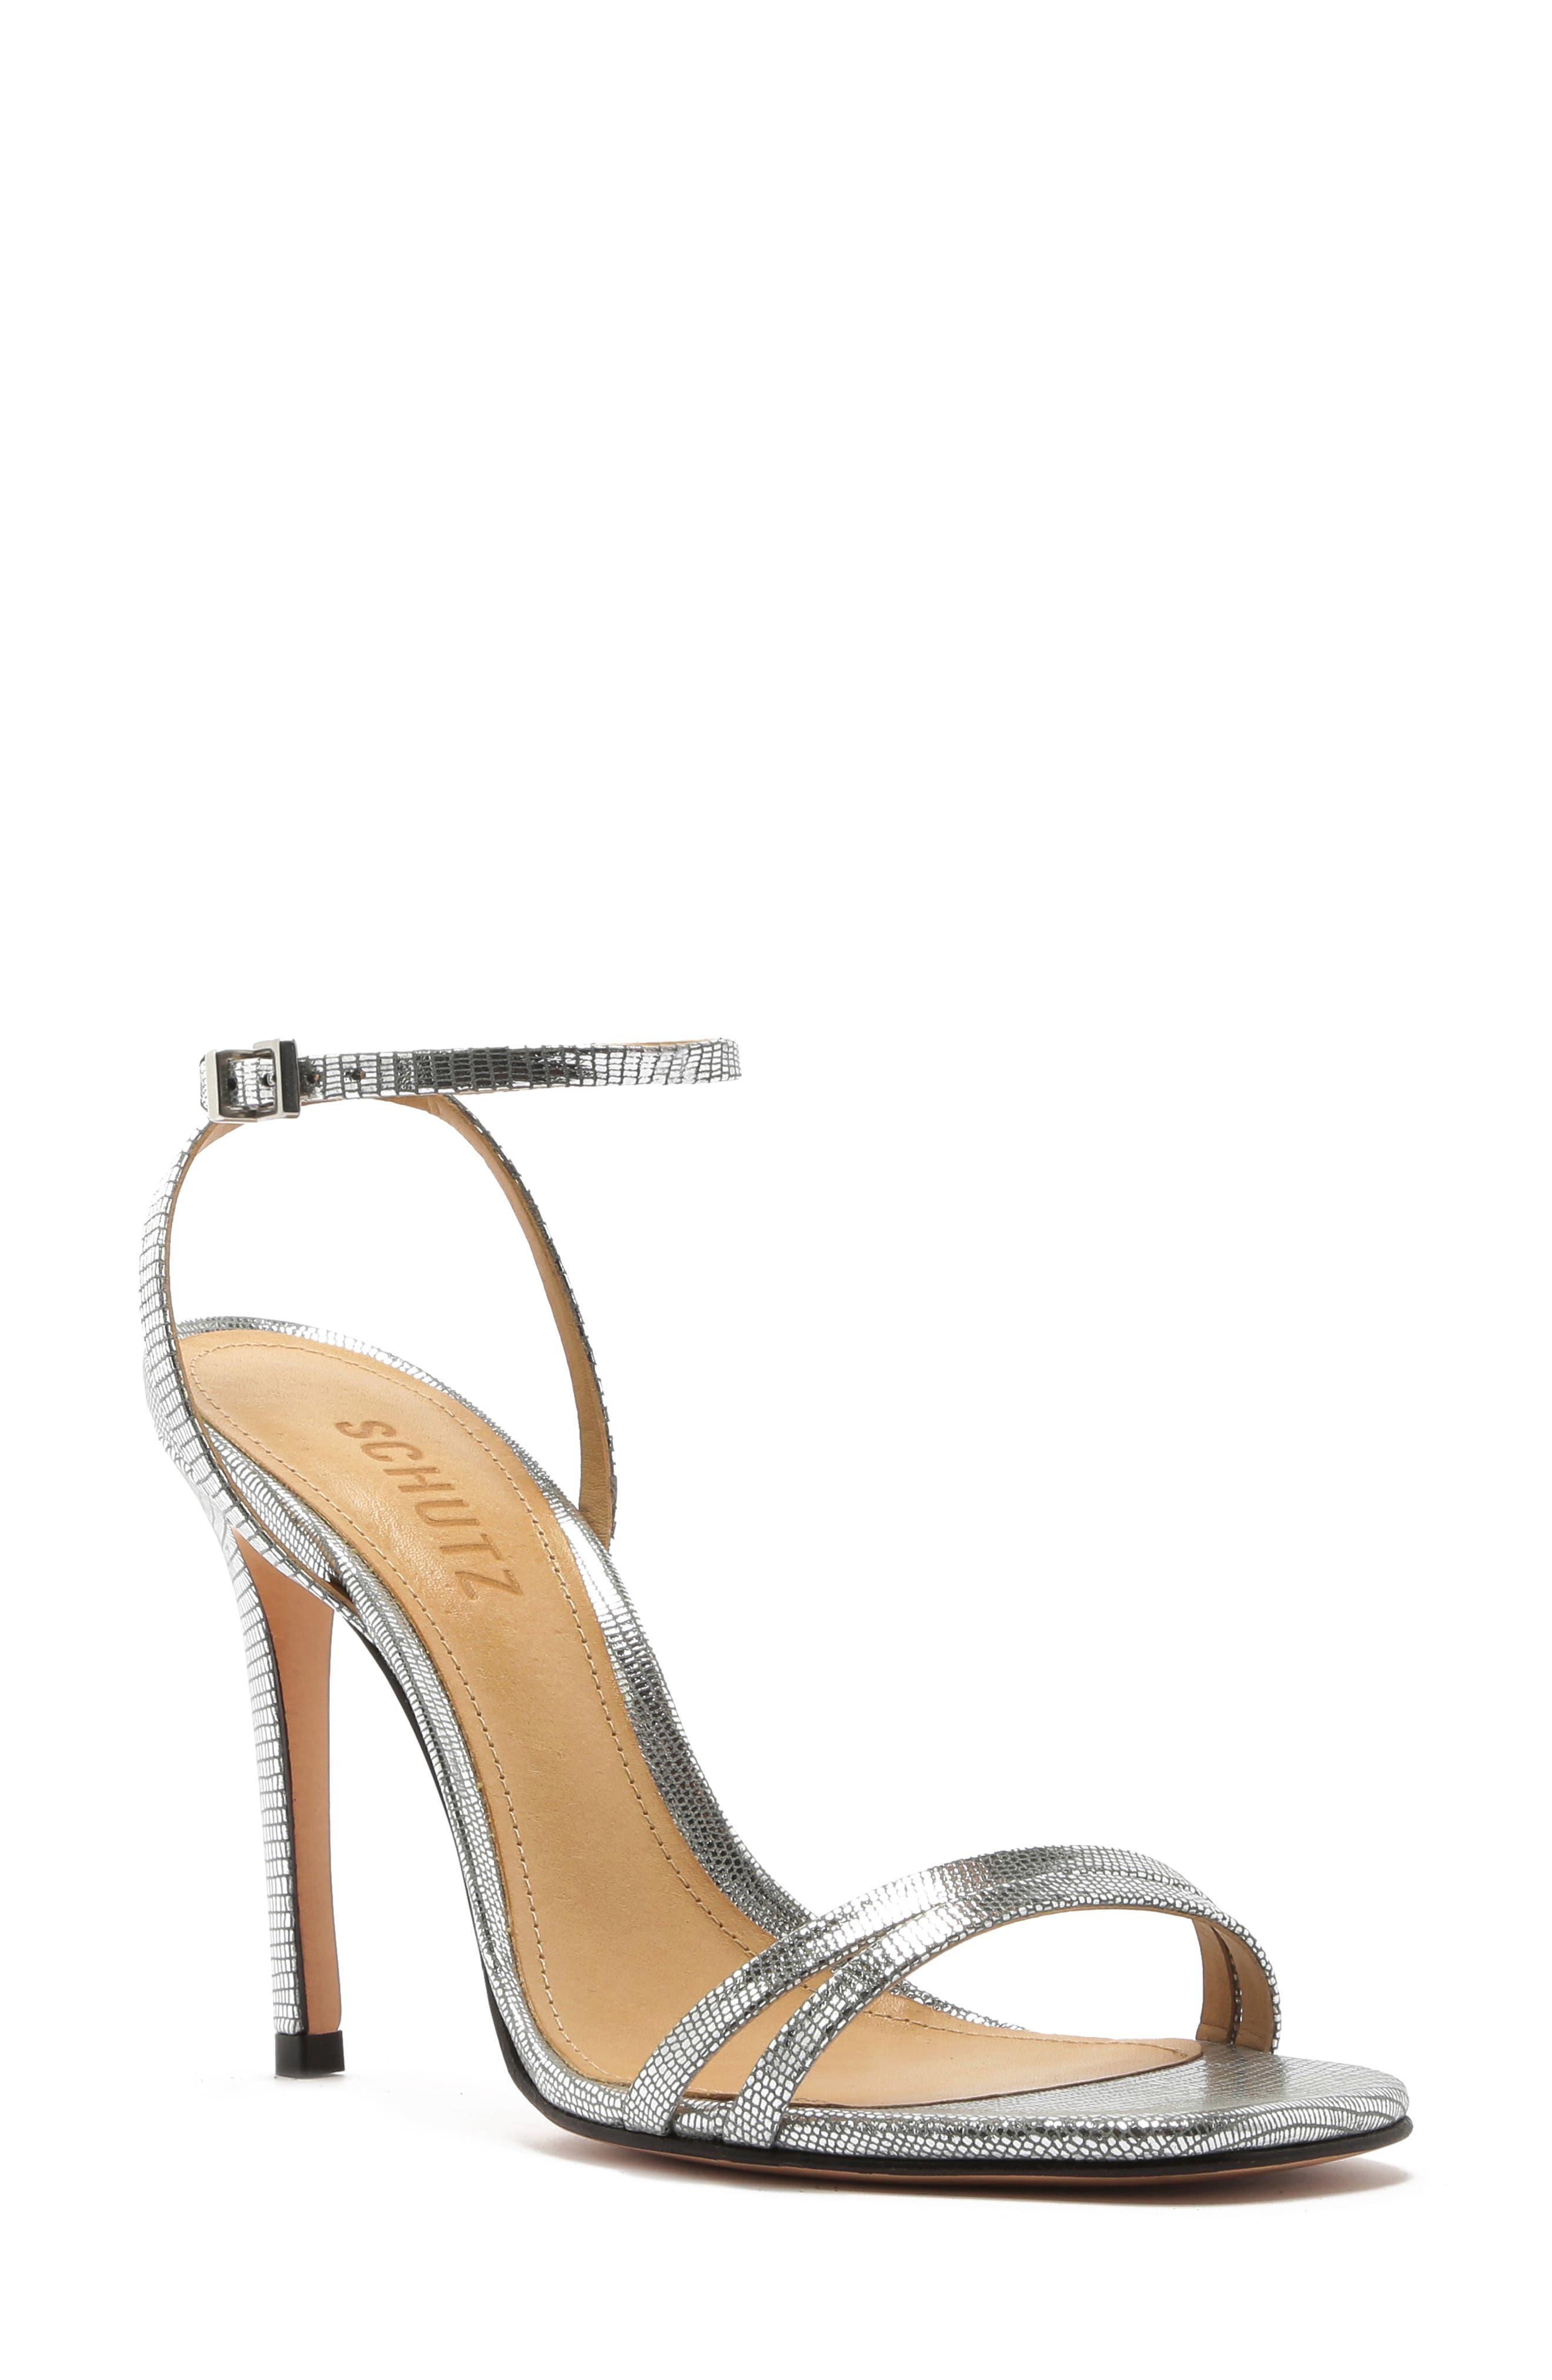 Schutz Slippers Altina Ankle Strap Sandal